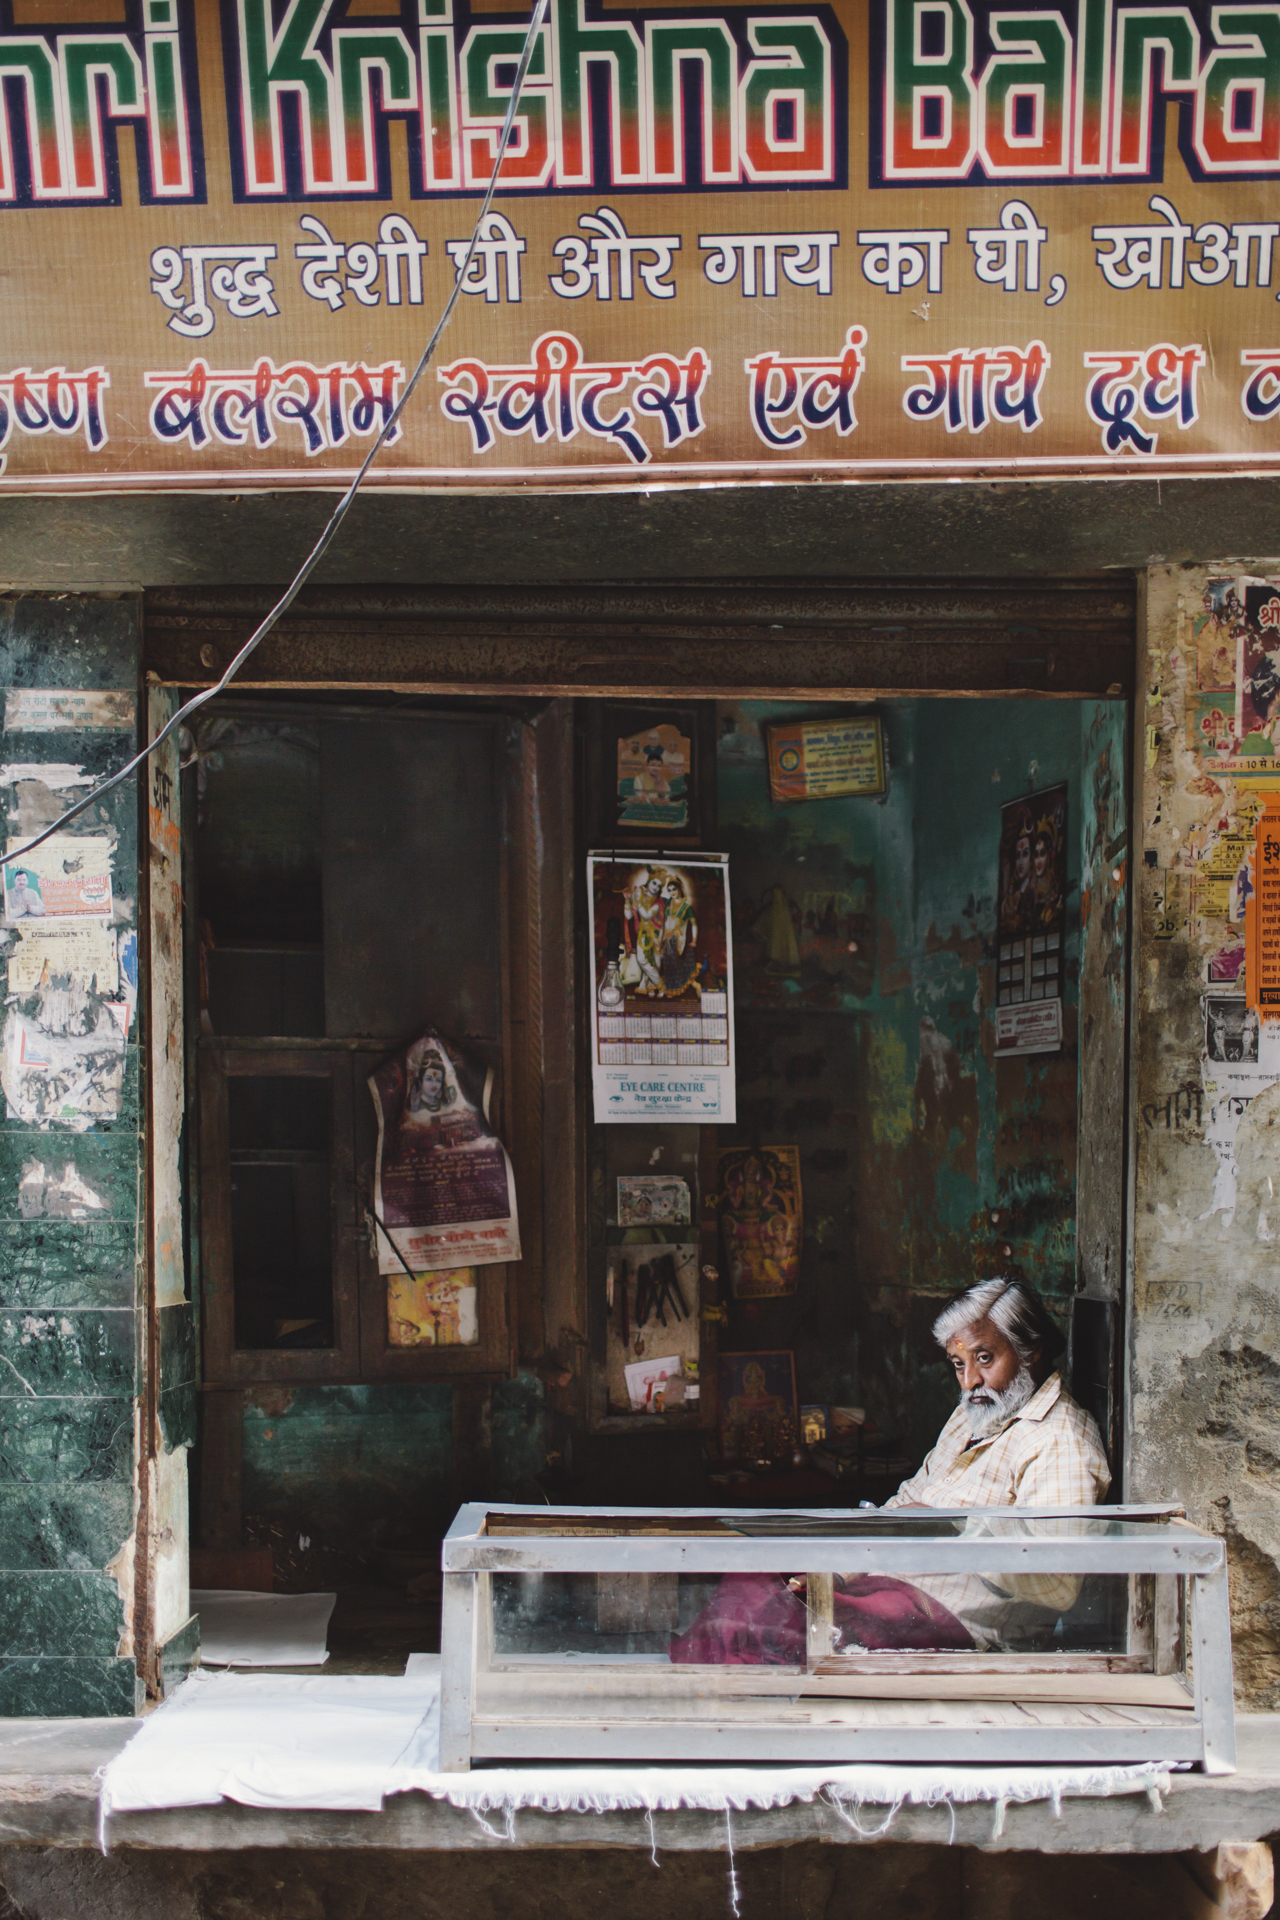 INDIA-WEB-1076.JPG